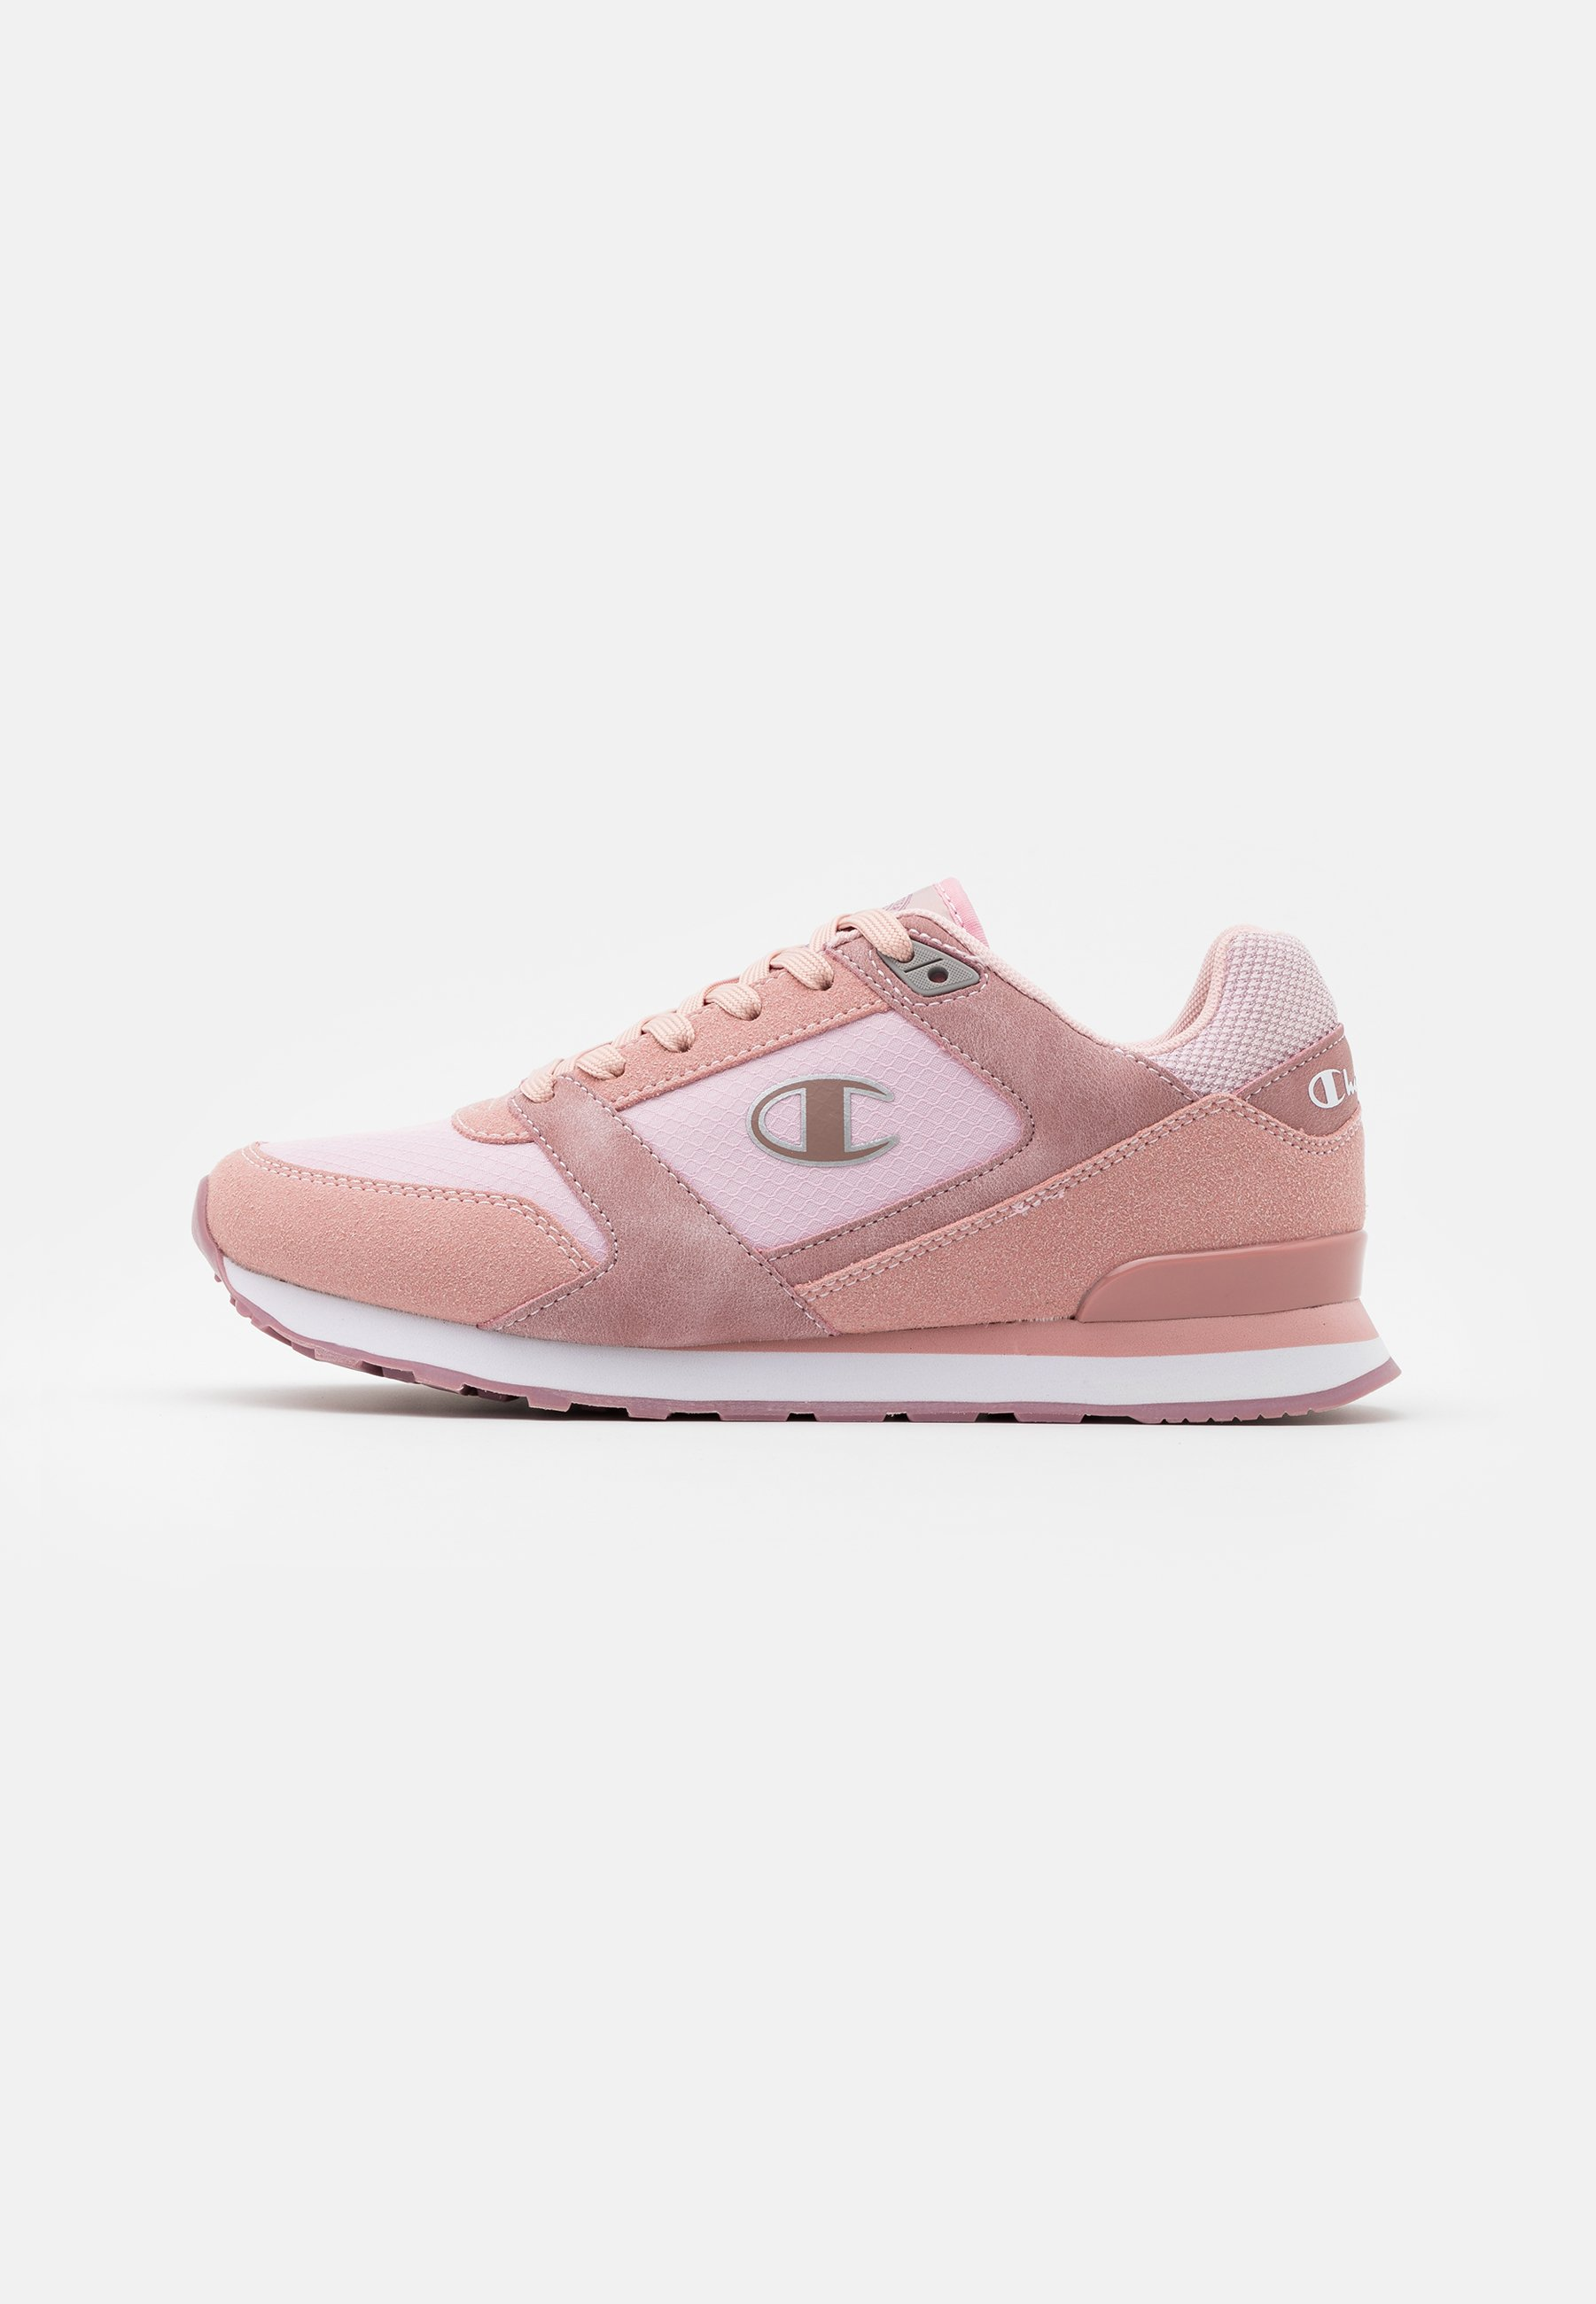 Champion Era Rose Schuhe Sneaker Rosa Weiß